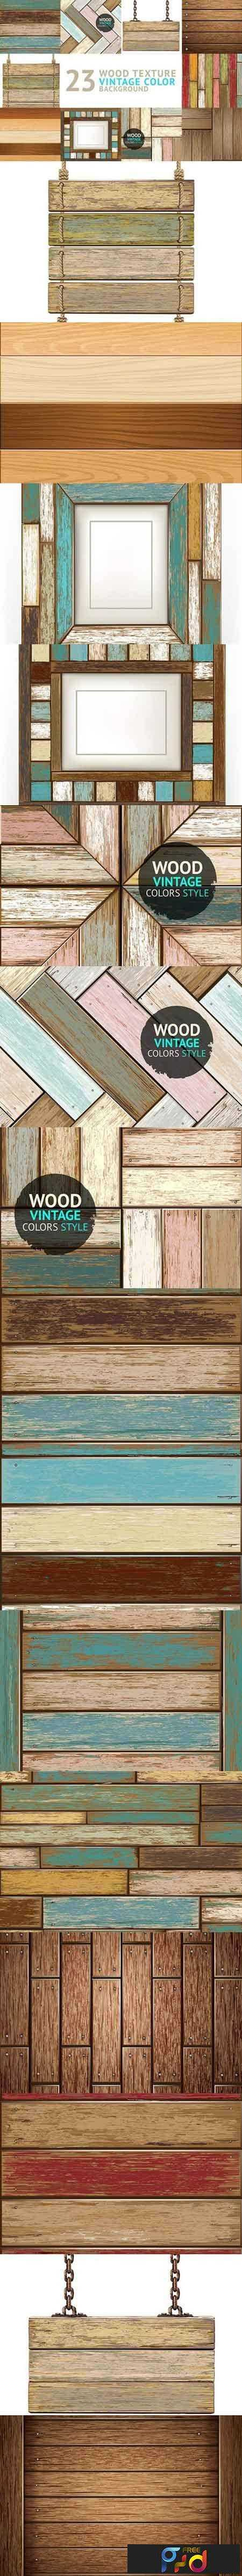 freepsdvn-com_1475953060_23-wooden-textures-surfaces-805033